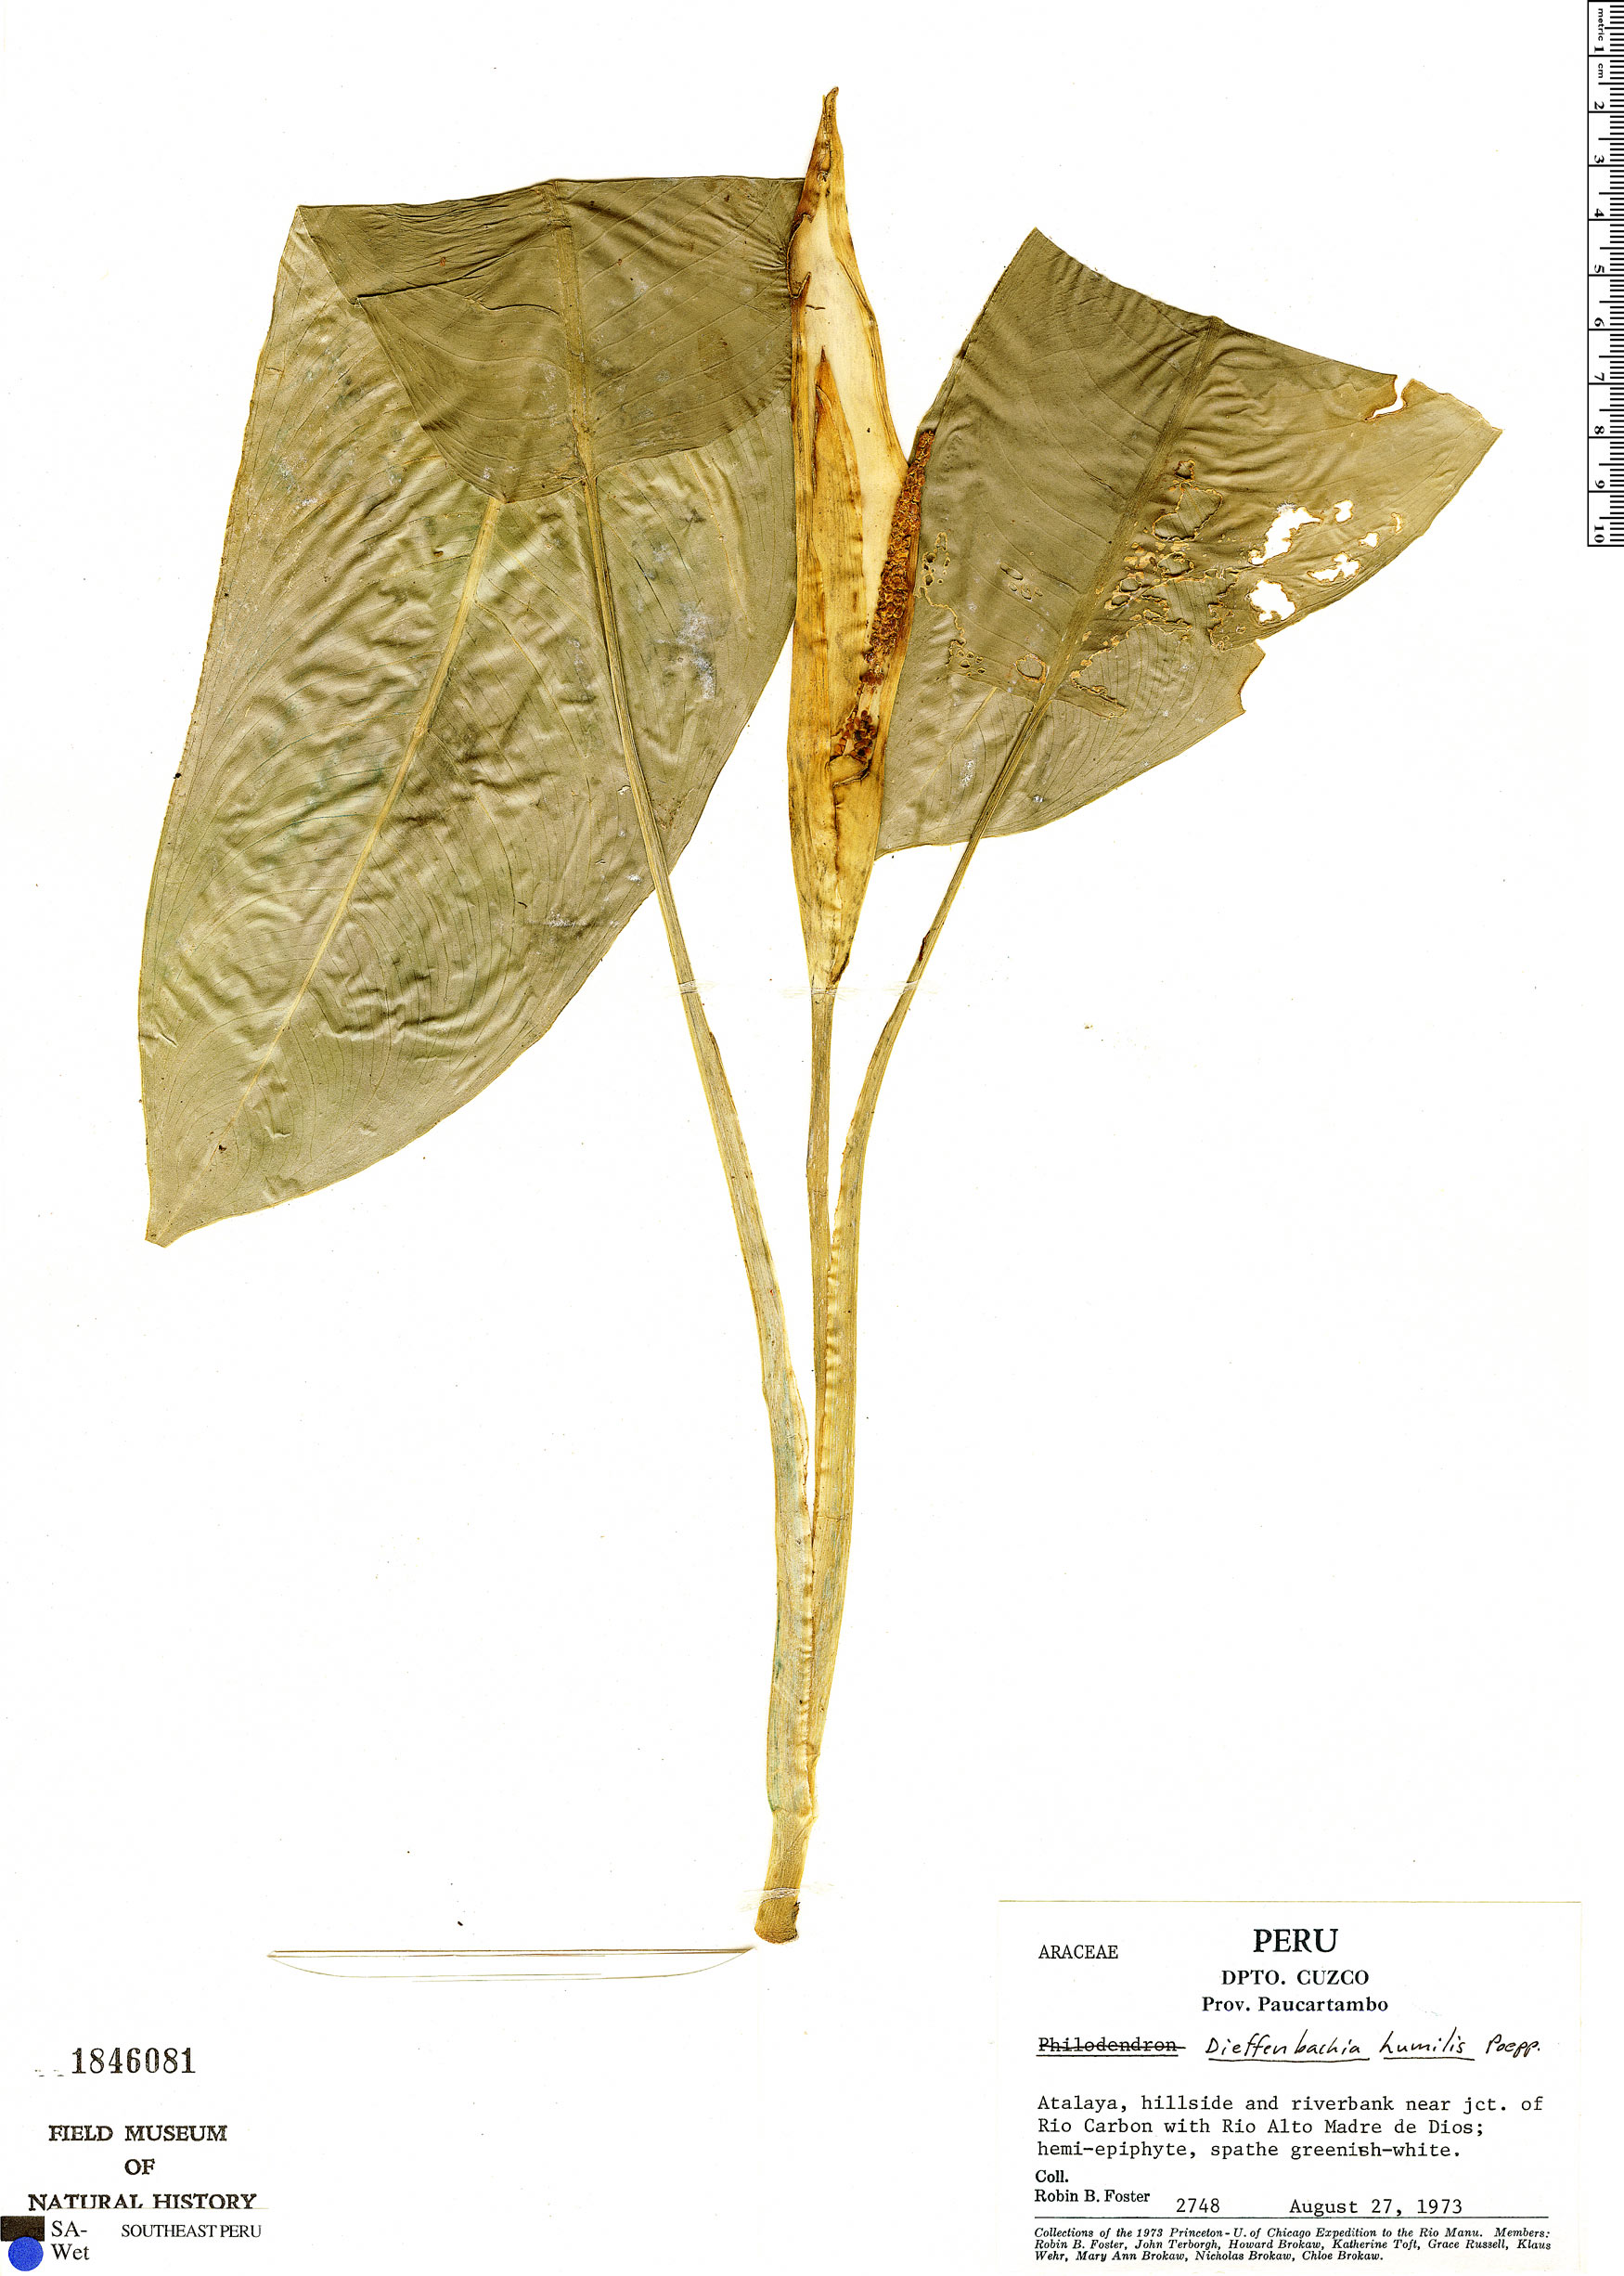 Specimen: Dieffenbachia